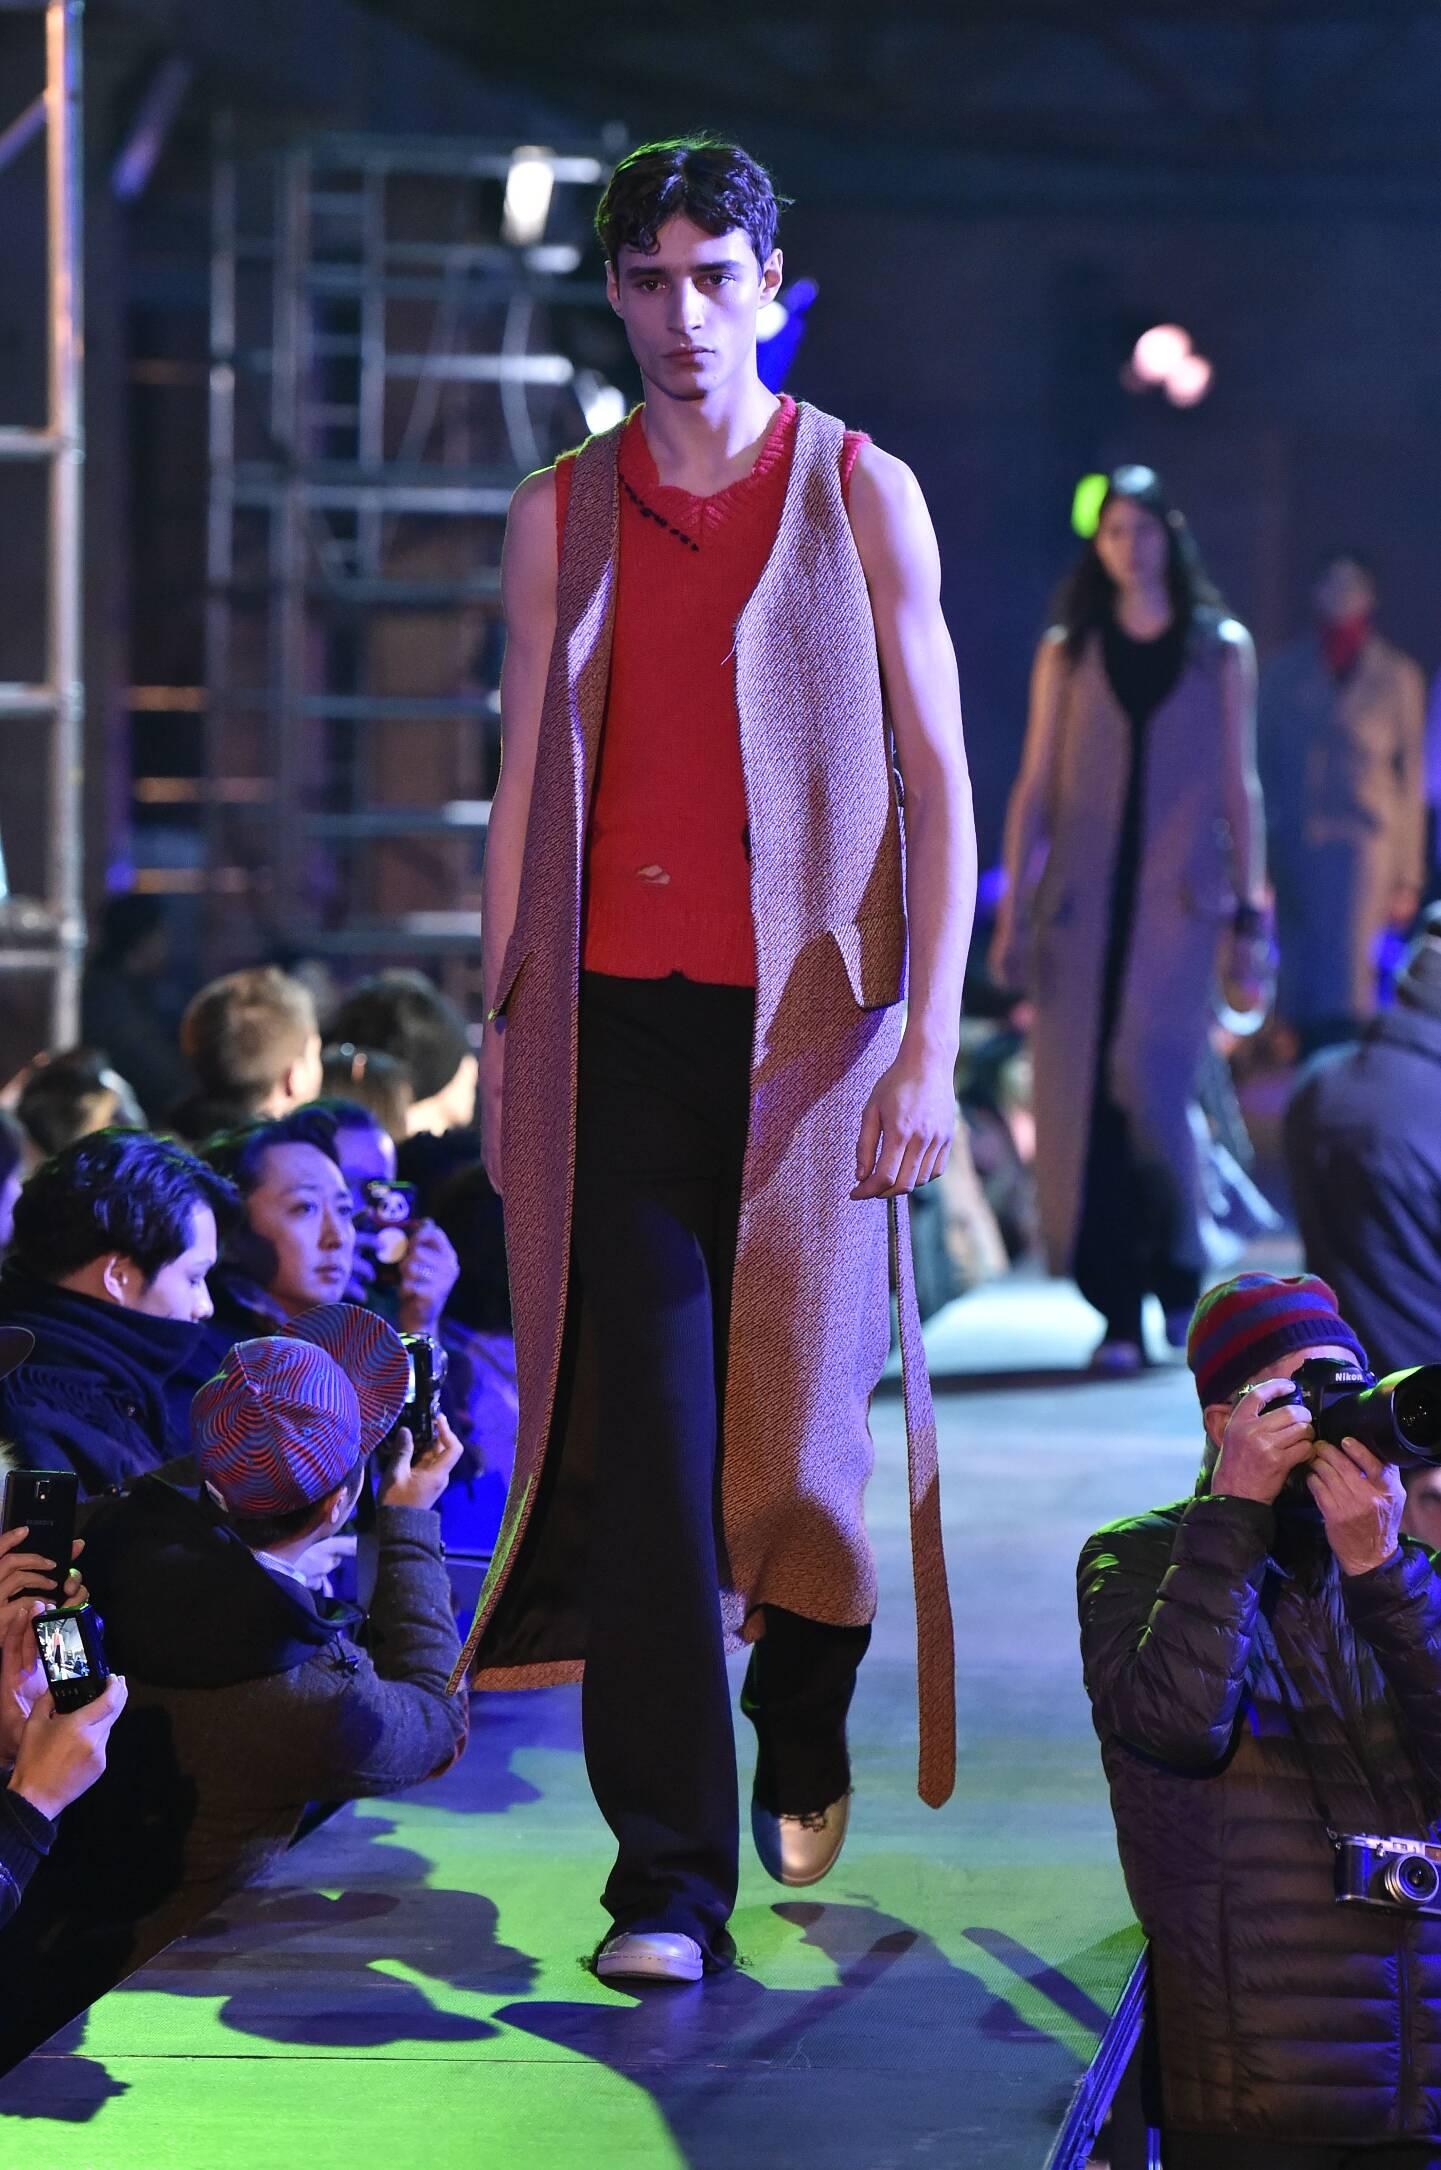 Runway Raf Simons Fall Winter 2015 16 Men's Collection Paris Fashion Week